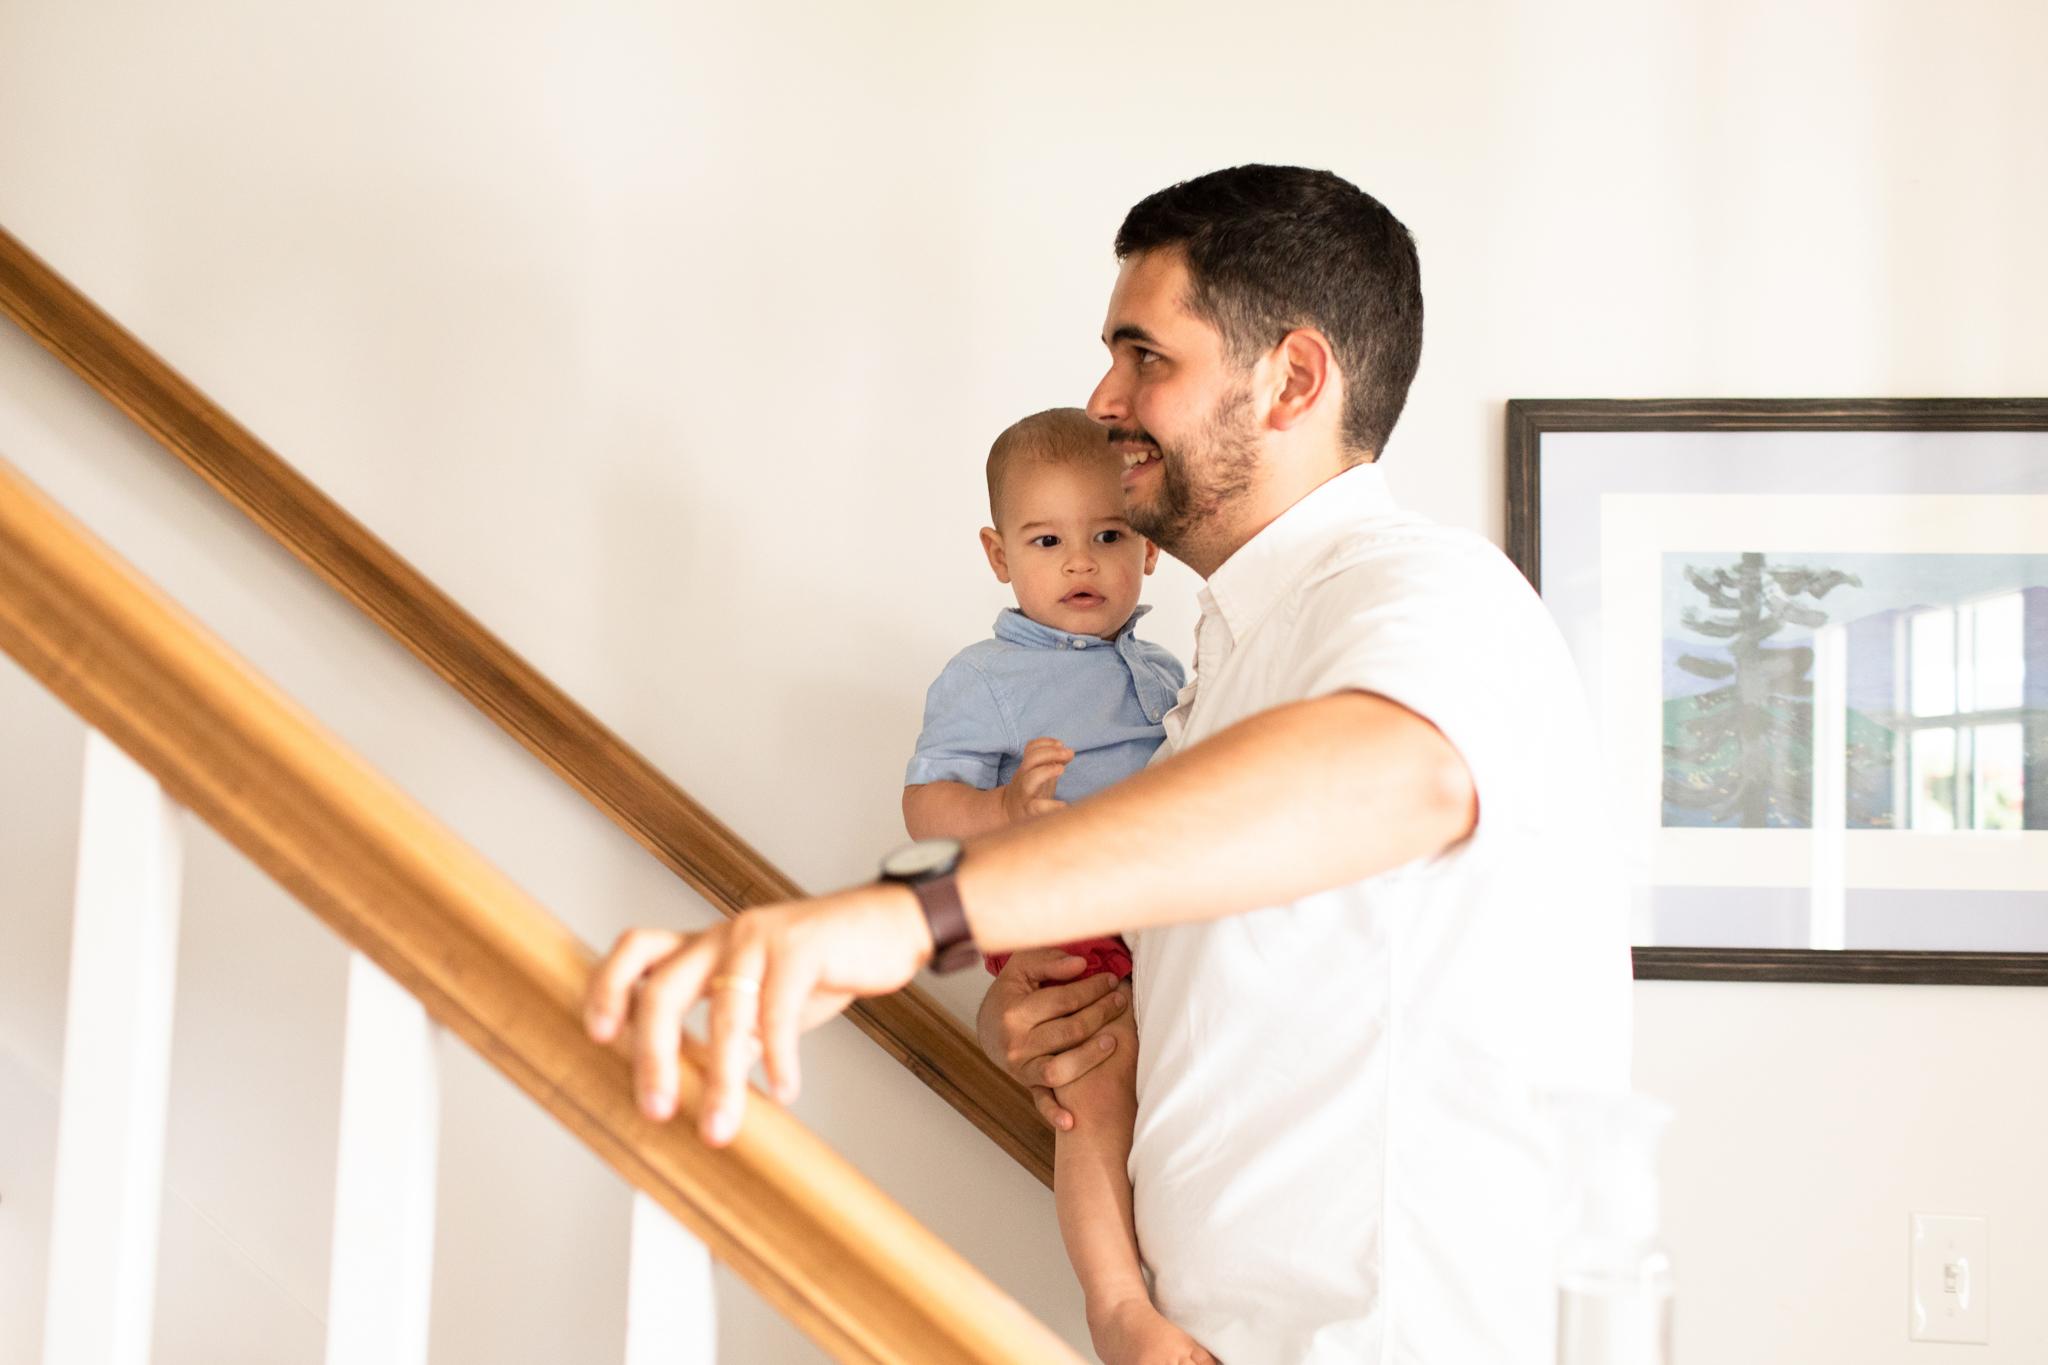 maine-family-baby-photographer-stepheney-collins -3.jpg